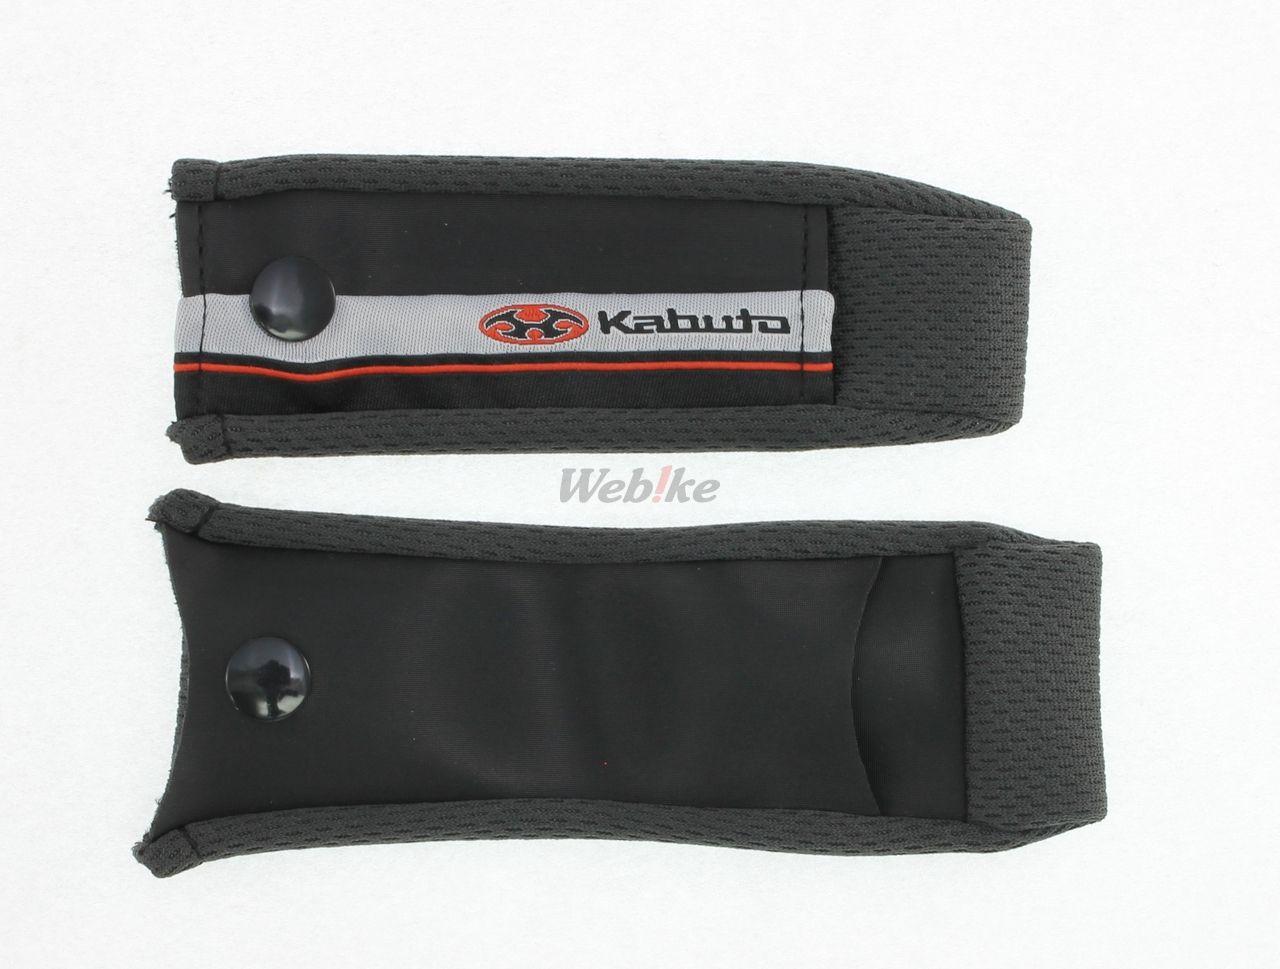 【OGK KABUTO】安全帽下巴扣環護套組 - 「Webike-摩托百貨」